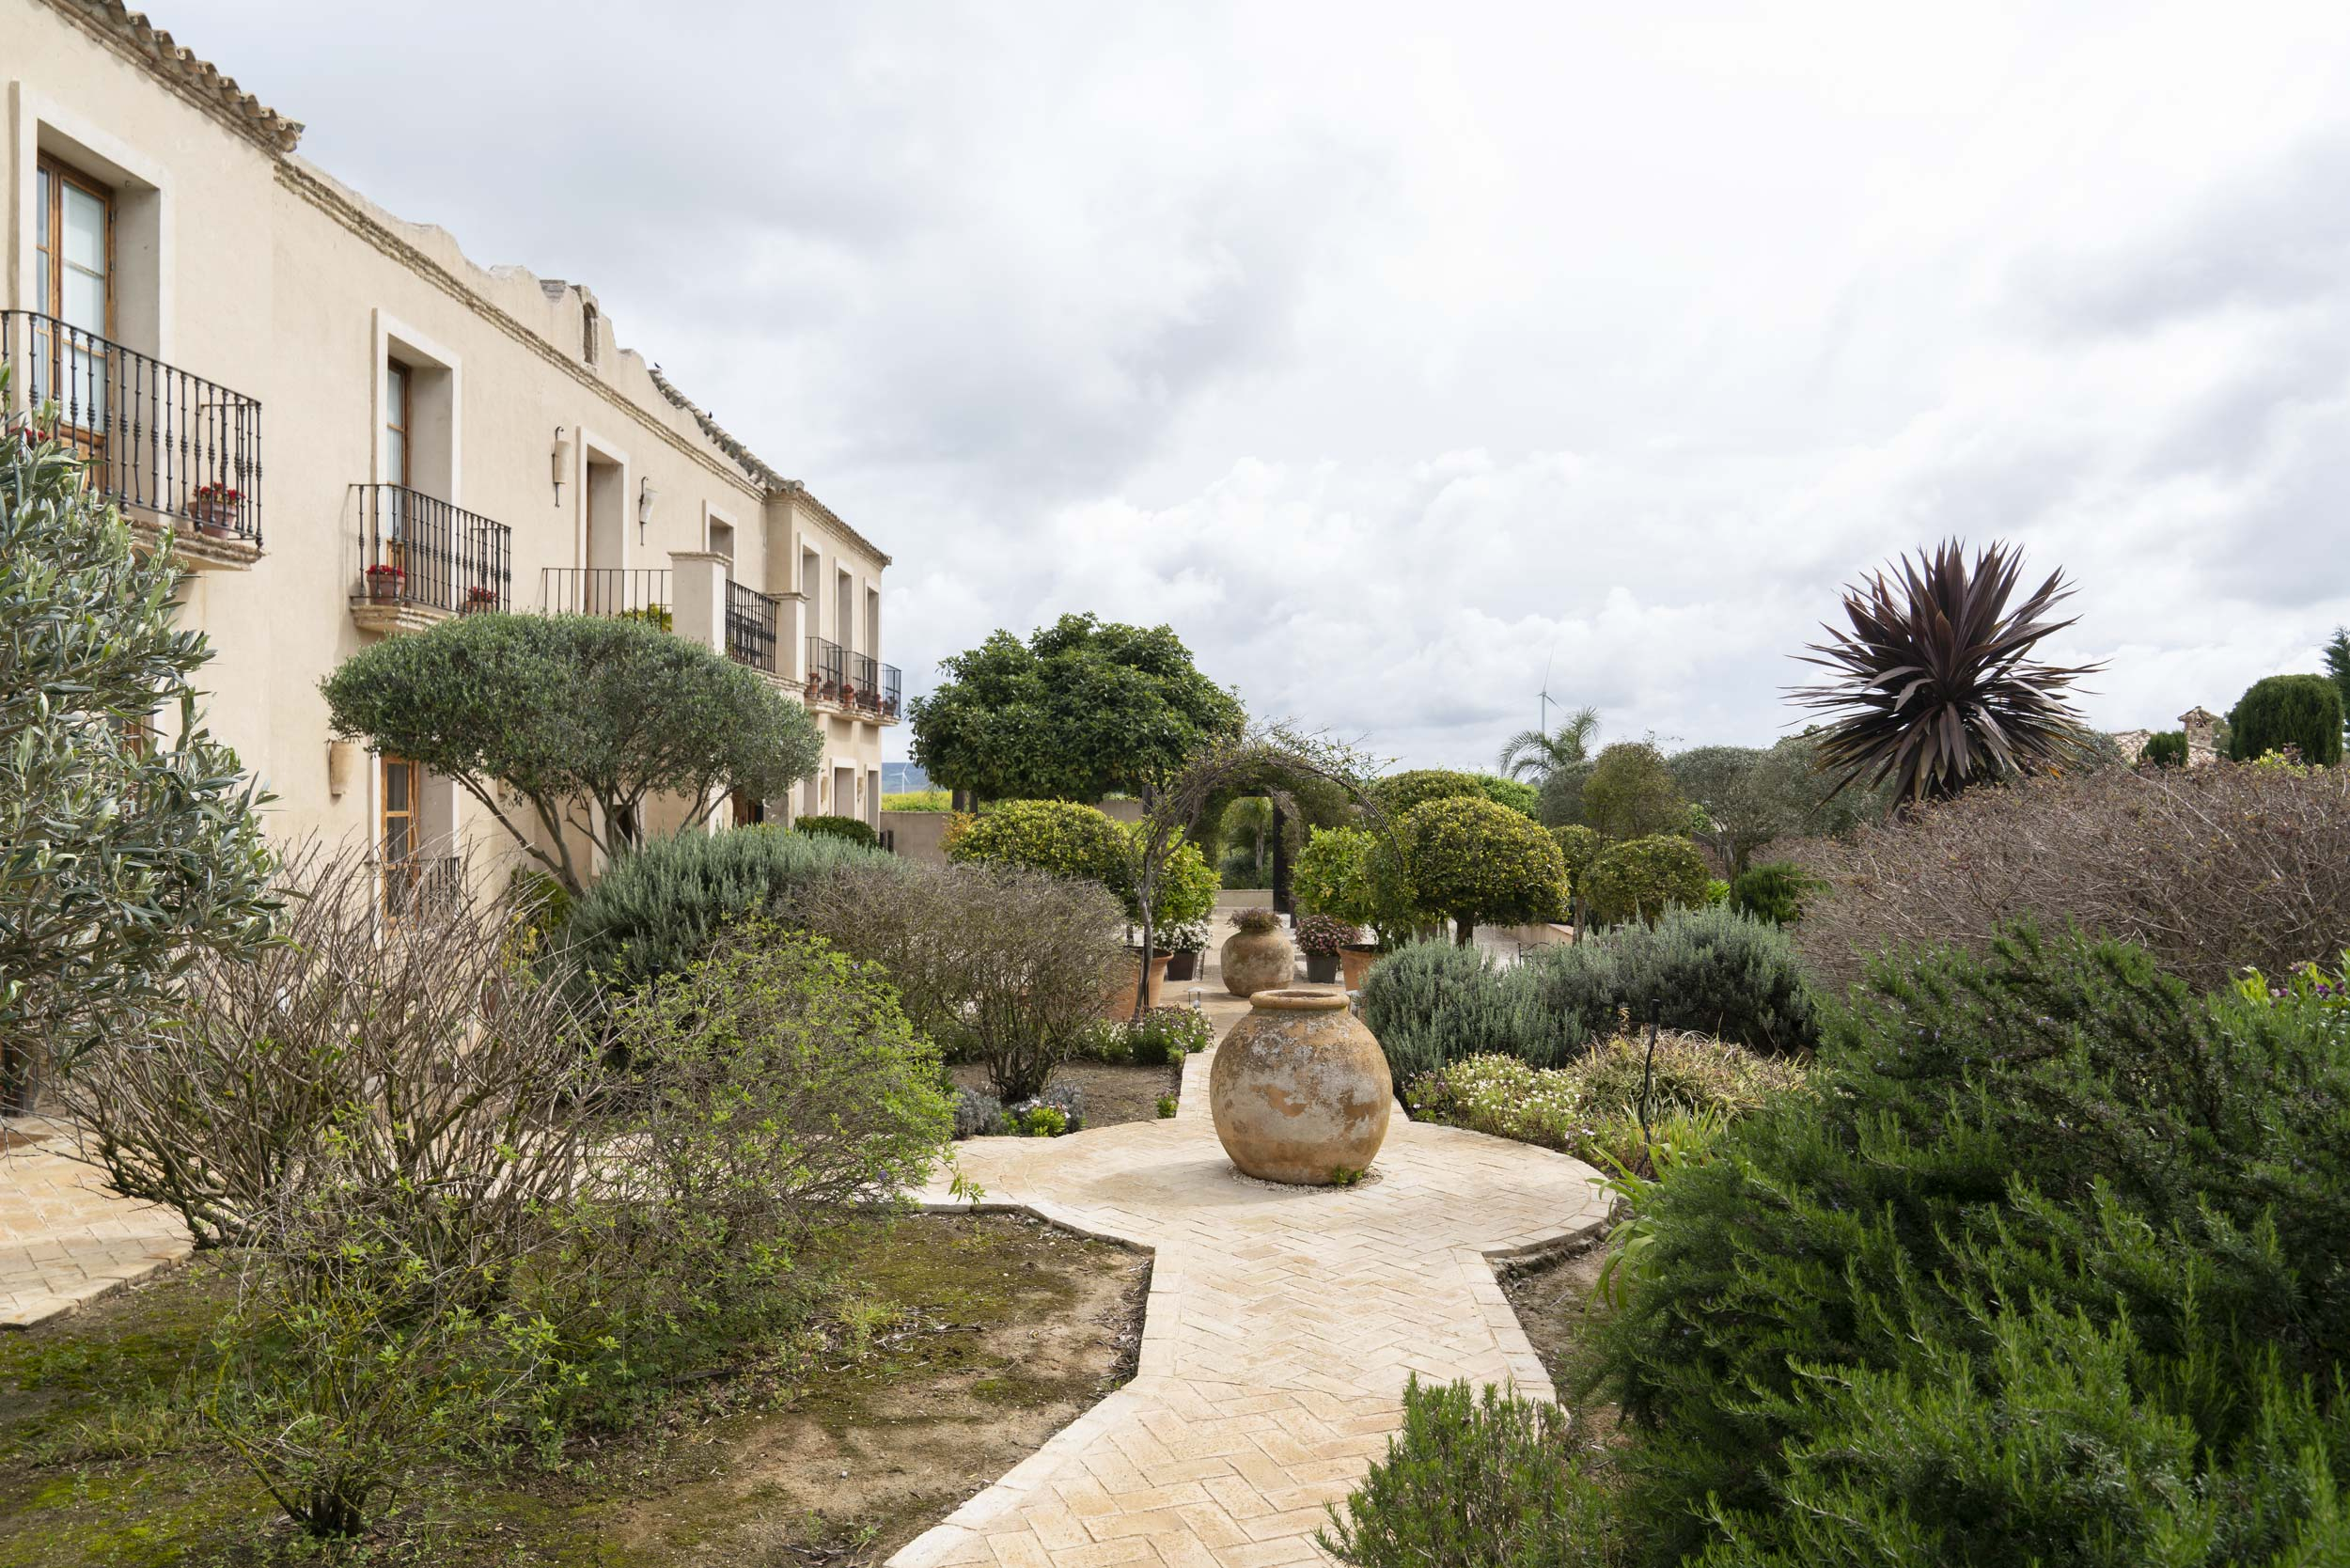 Casa-La-Siesta-Spain-Fiona-Burrage-Photography-gardens.jpg